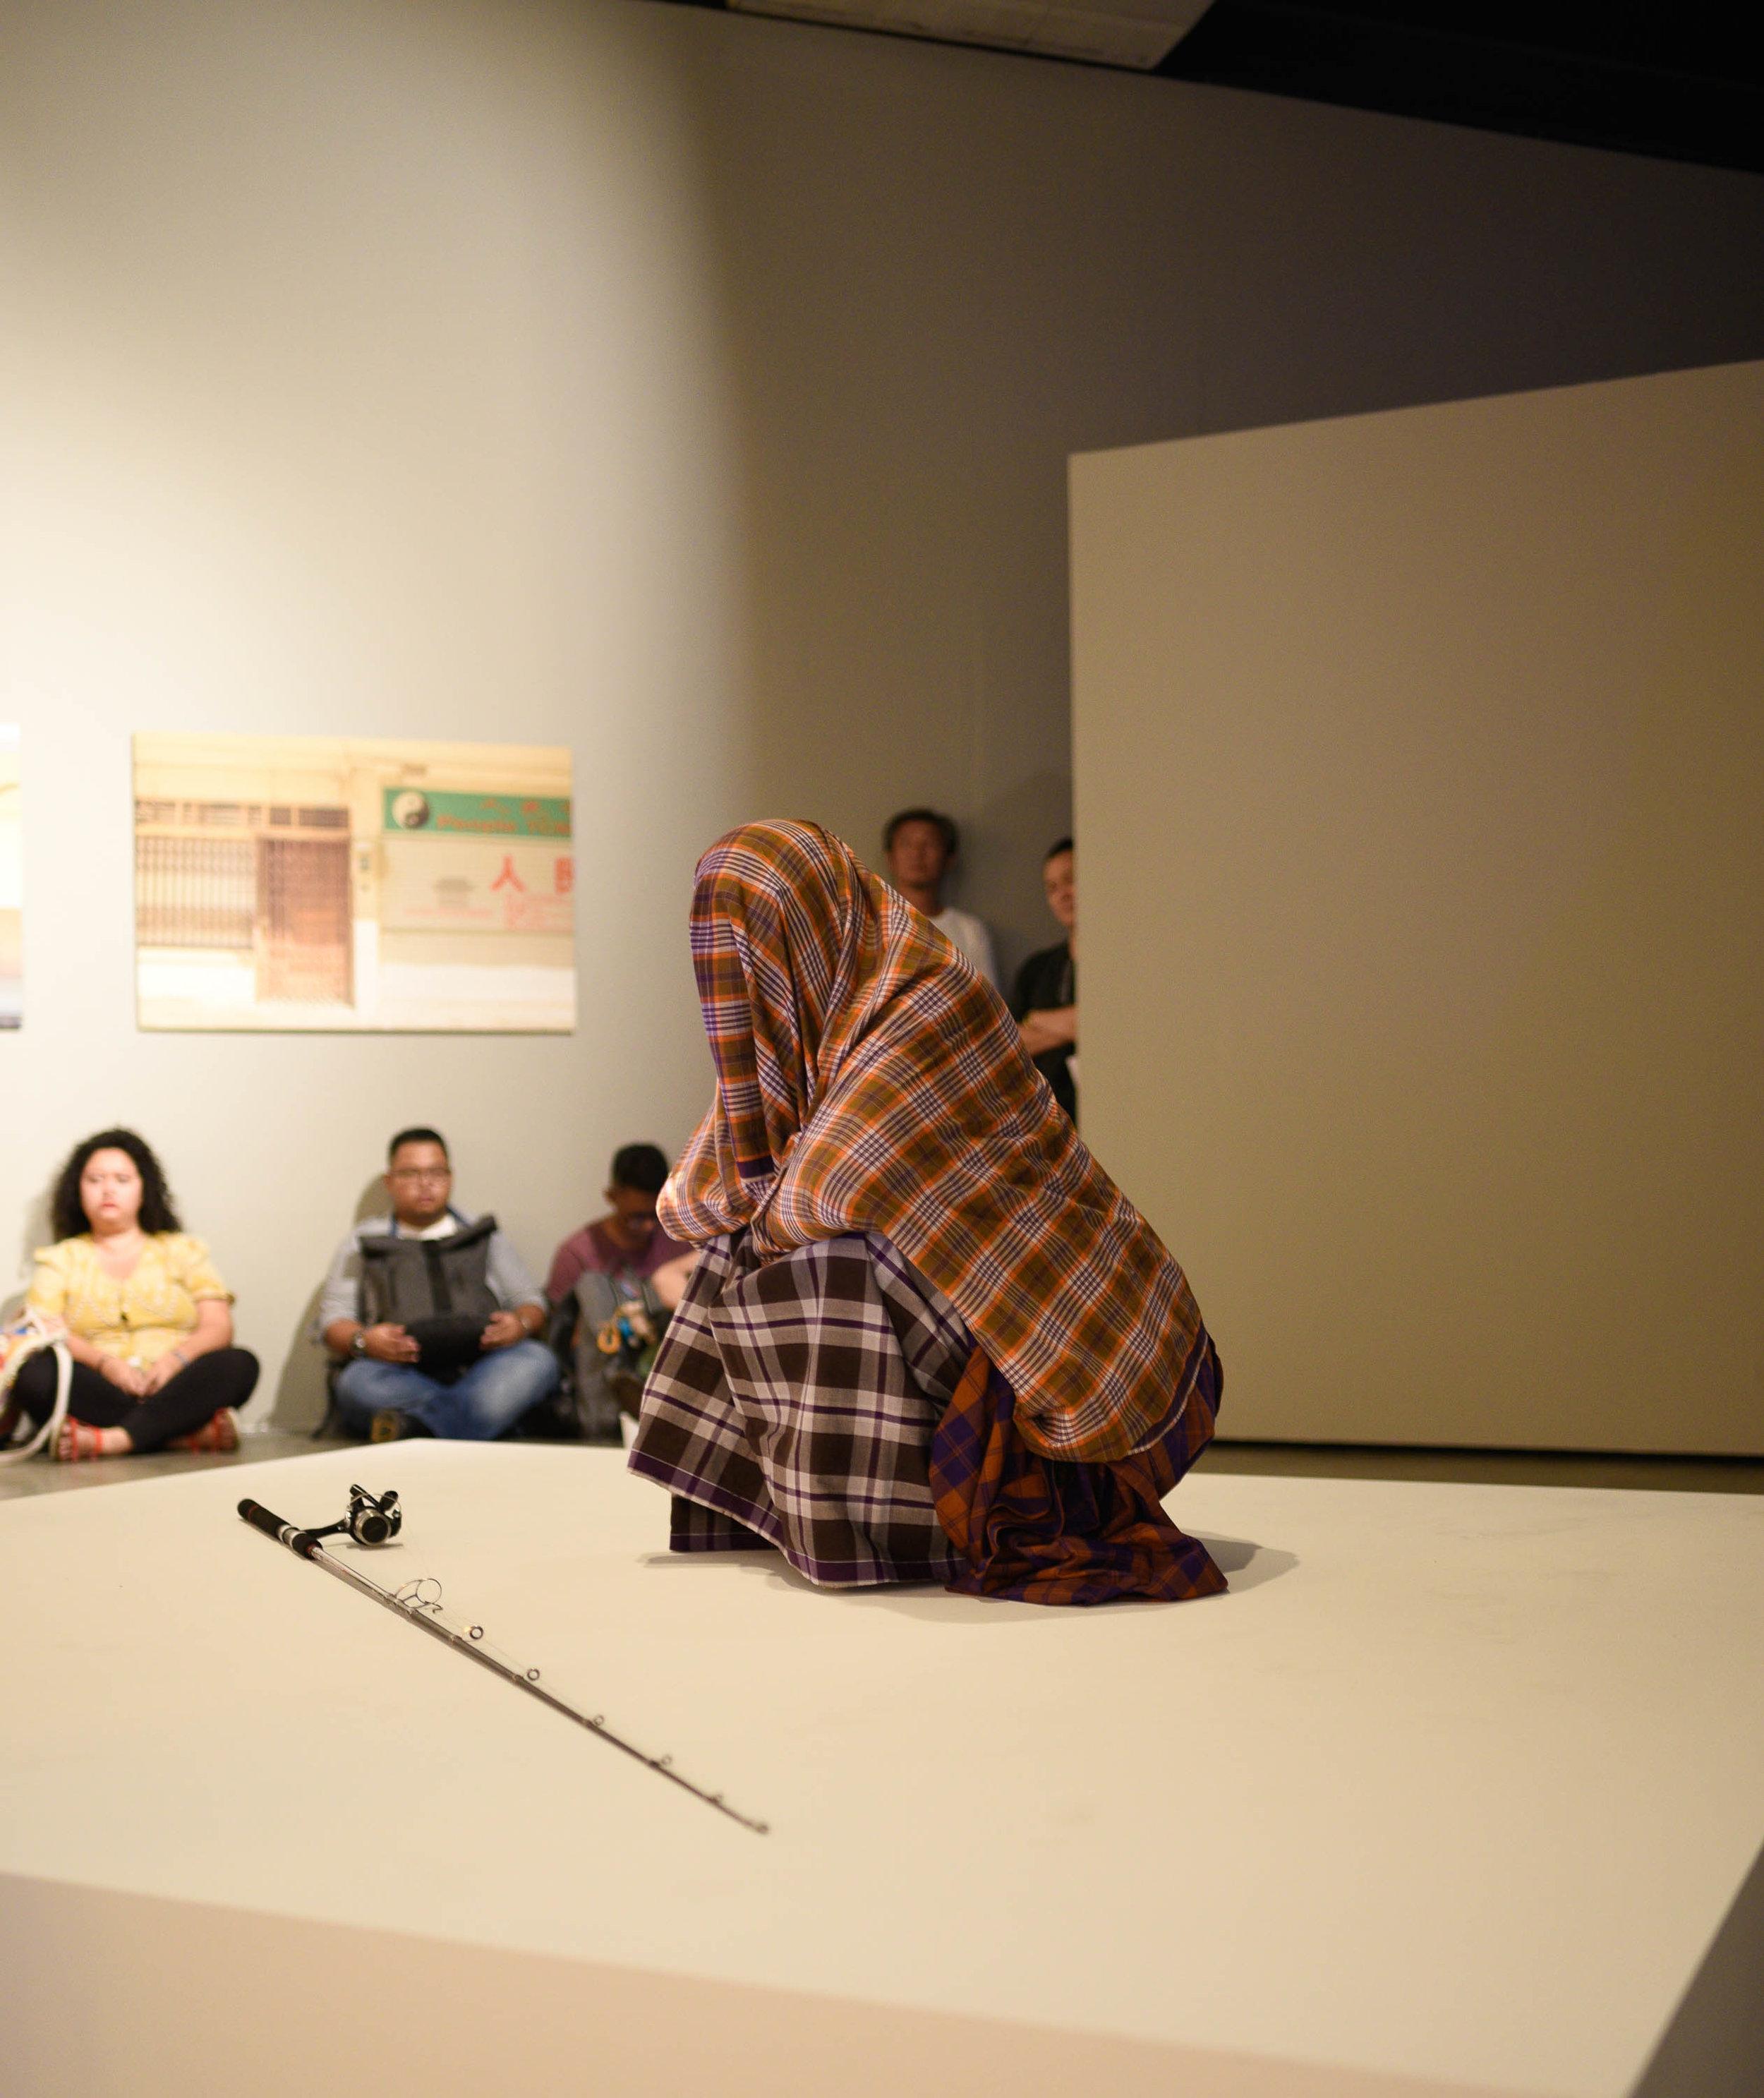 Farizi Noorfauzi, 'Getaran Jiwa', 2019, performance. Photo by Ivan Ong.